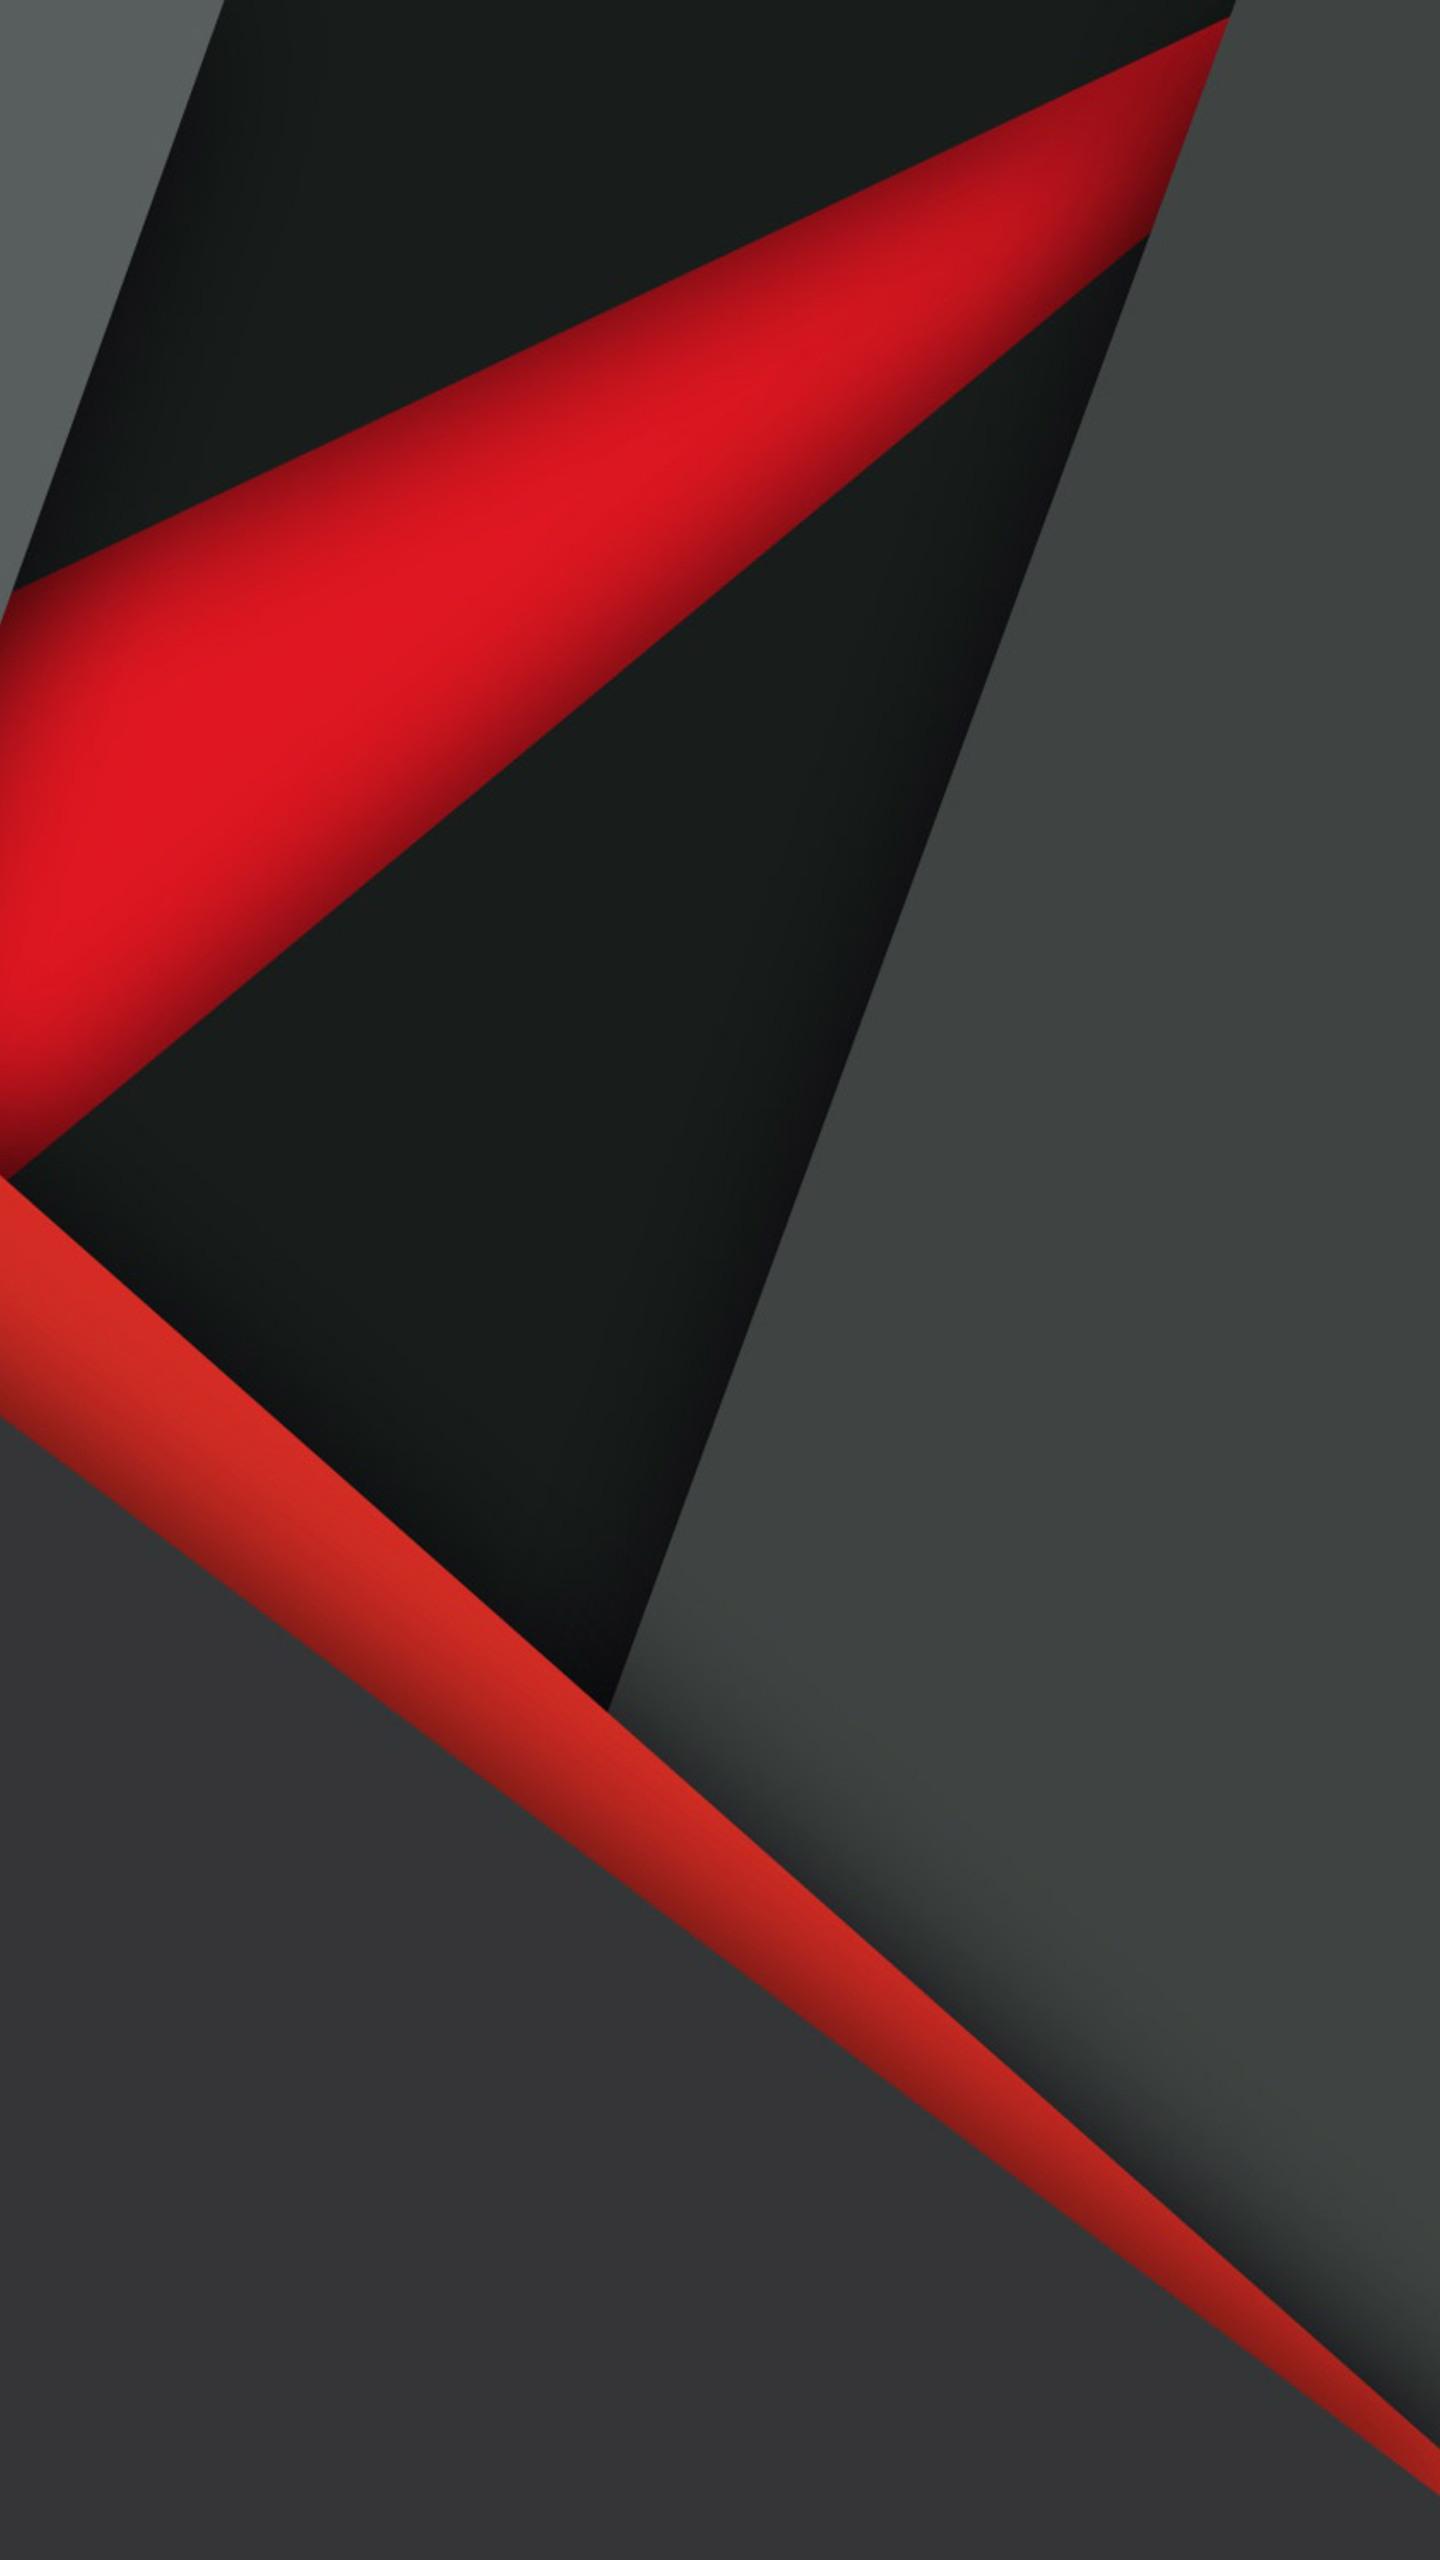 Acer Laptop Cute Wallpaper 1440x2560 Material Design Dark Red Black Samsung Galaxy S6